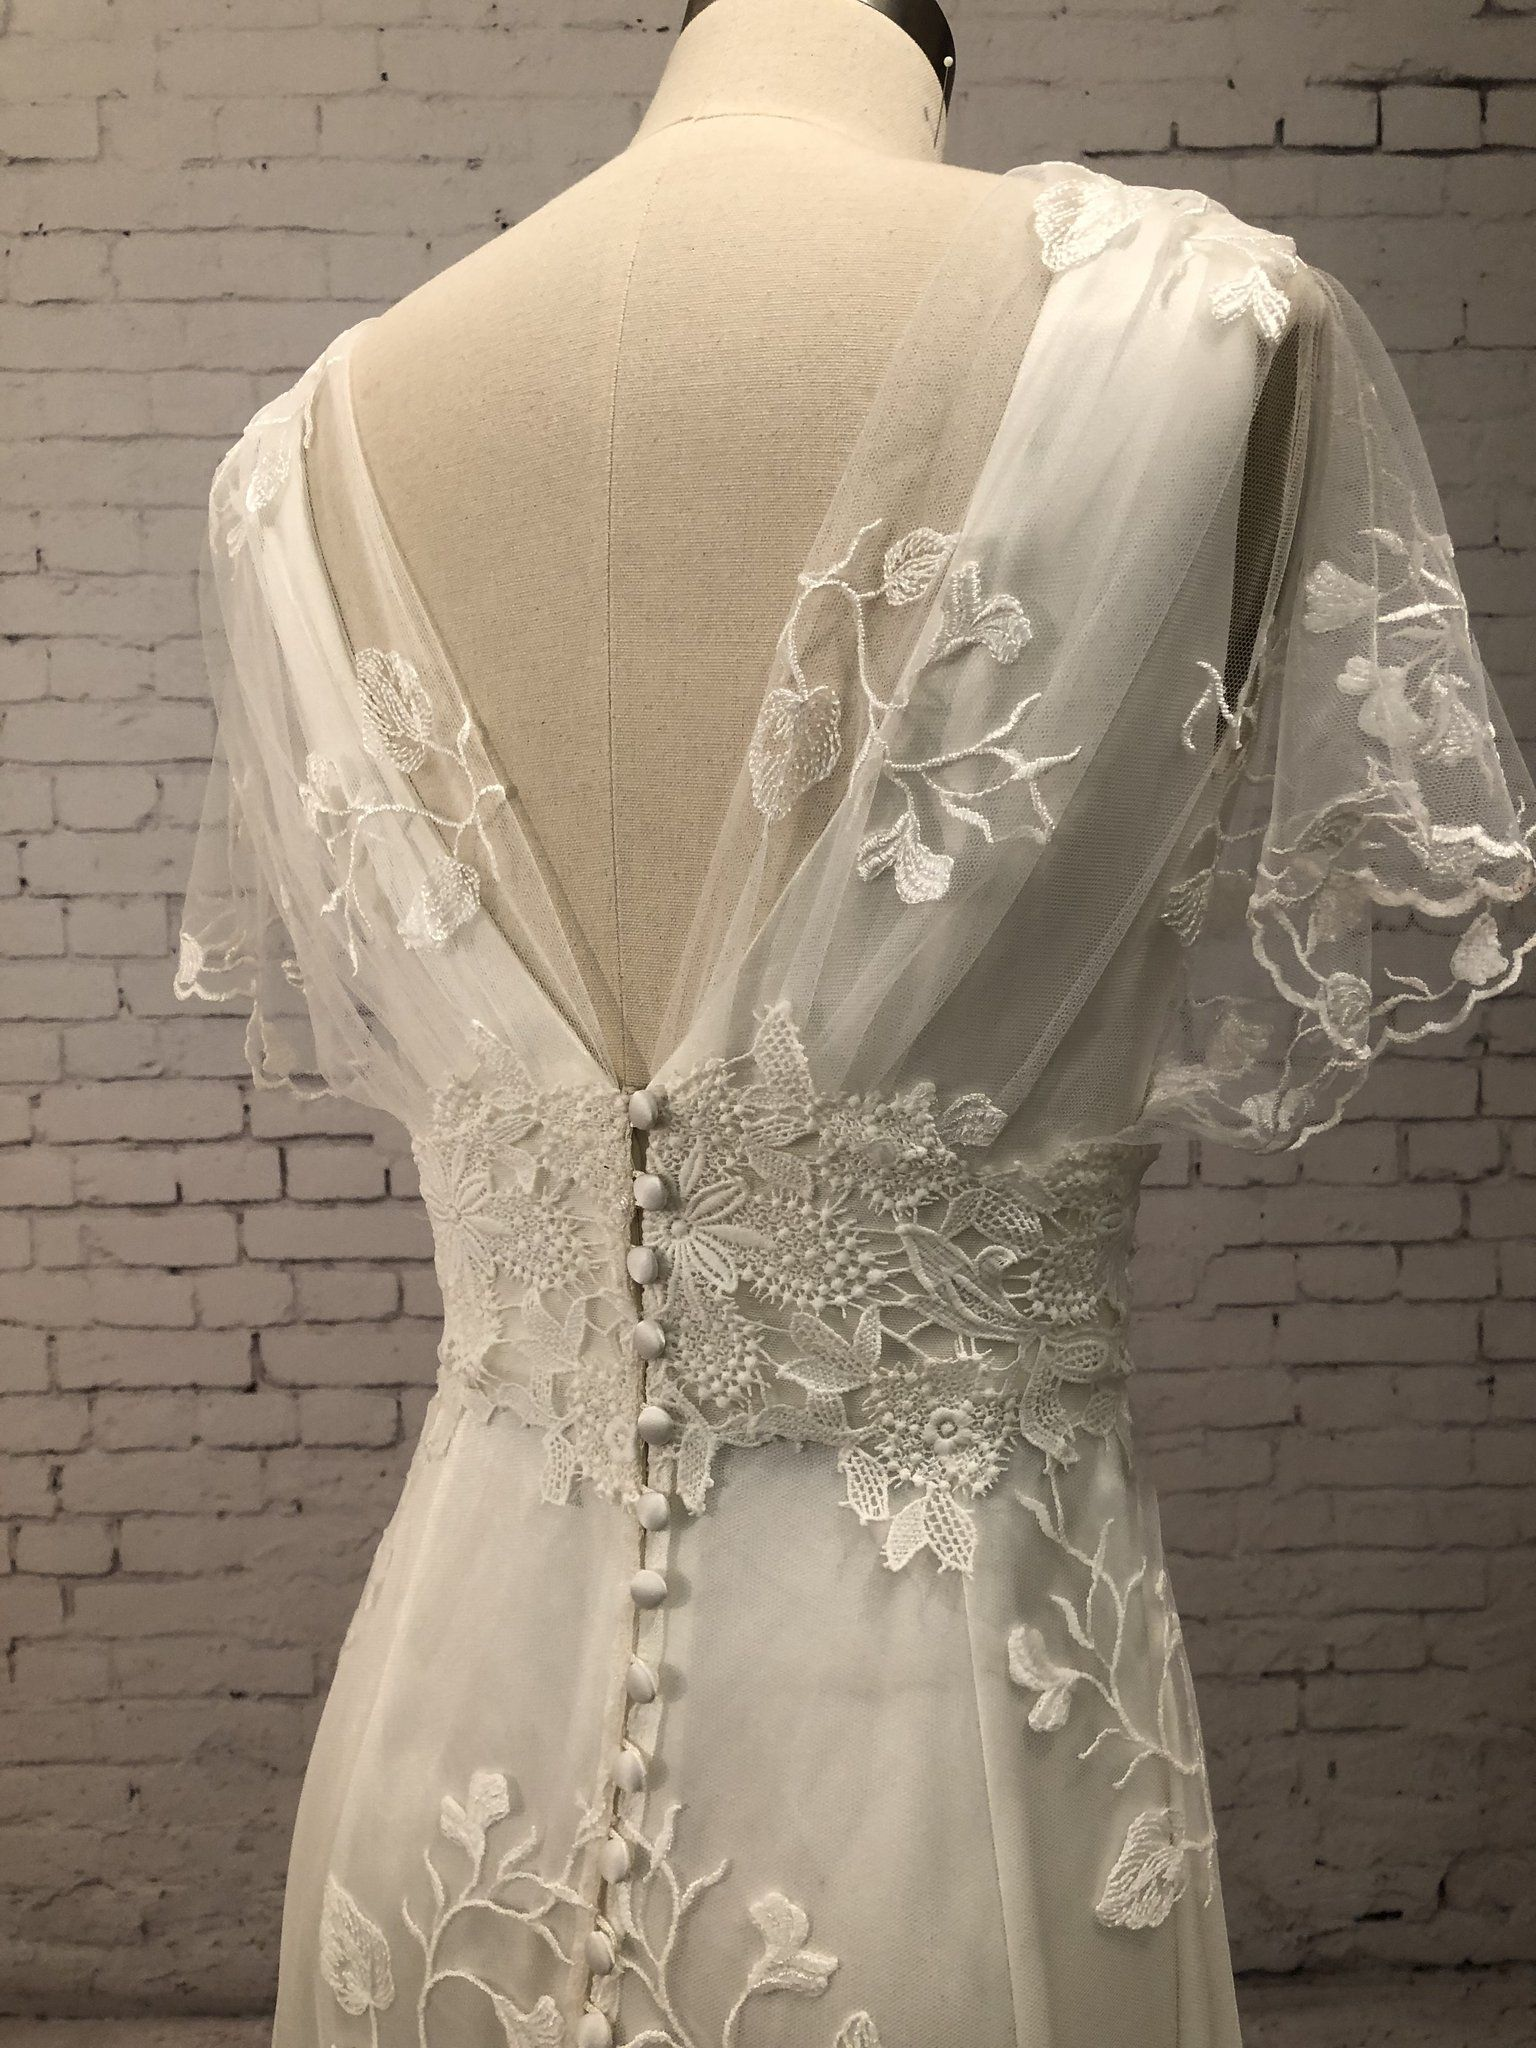 Helene Casual Wedding Dress Wedding Dresses Wedding Gowns Lace [ 2048 x 1536 Pixel ]